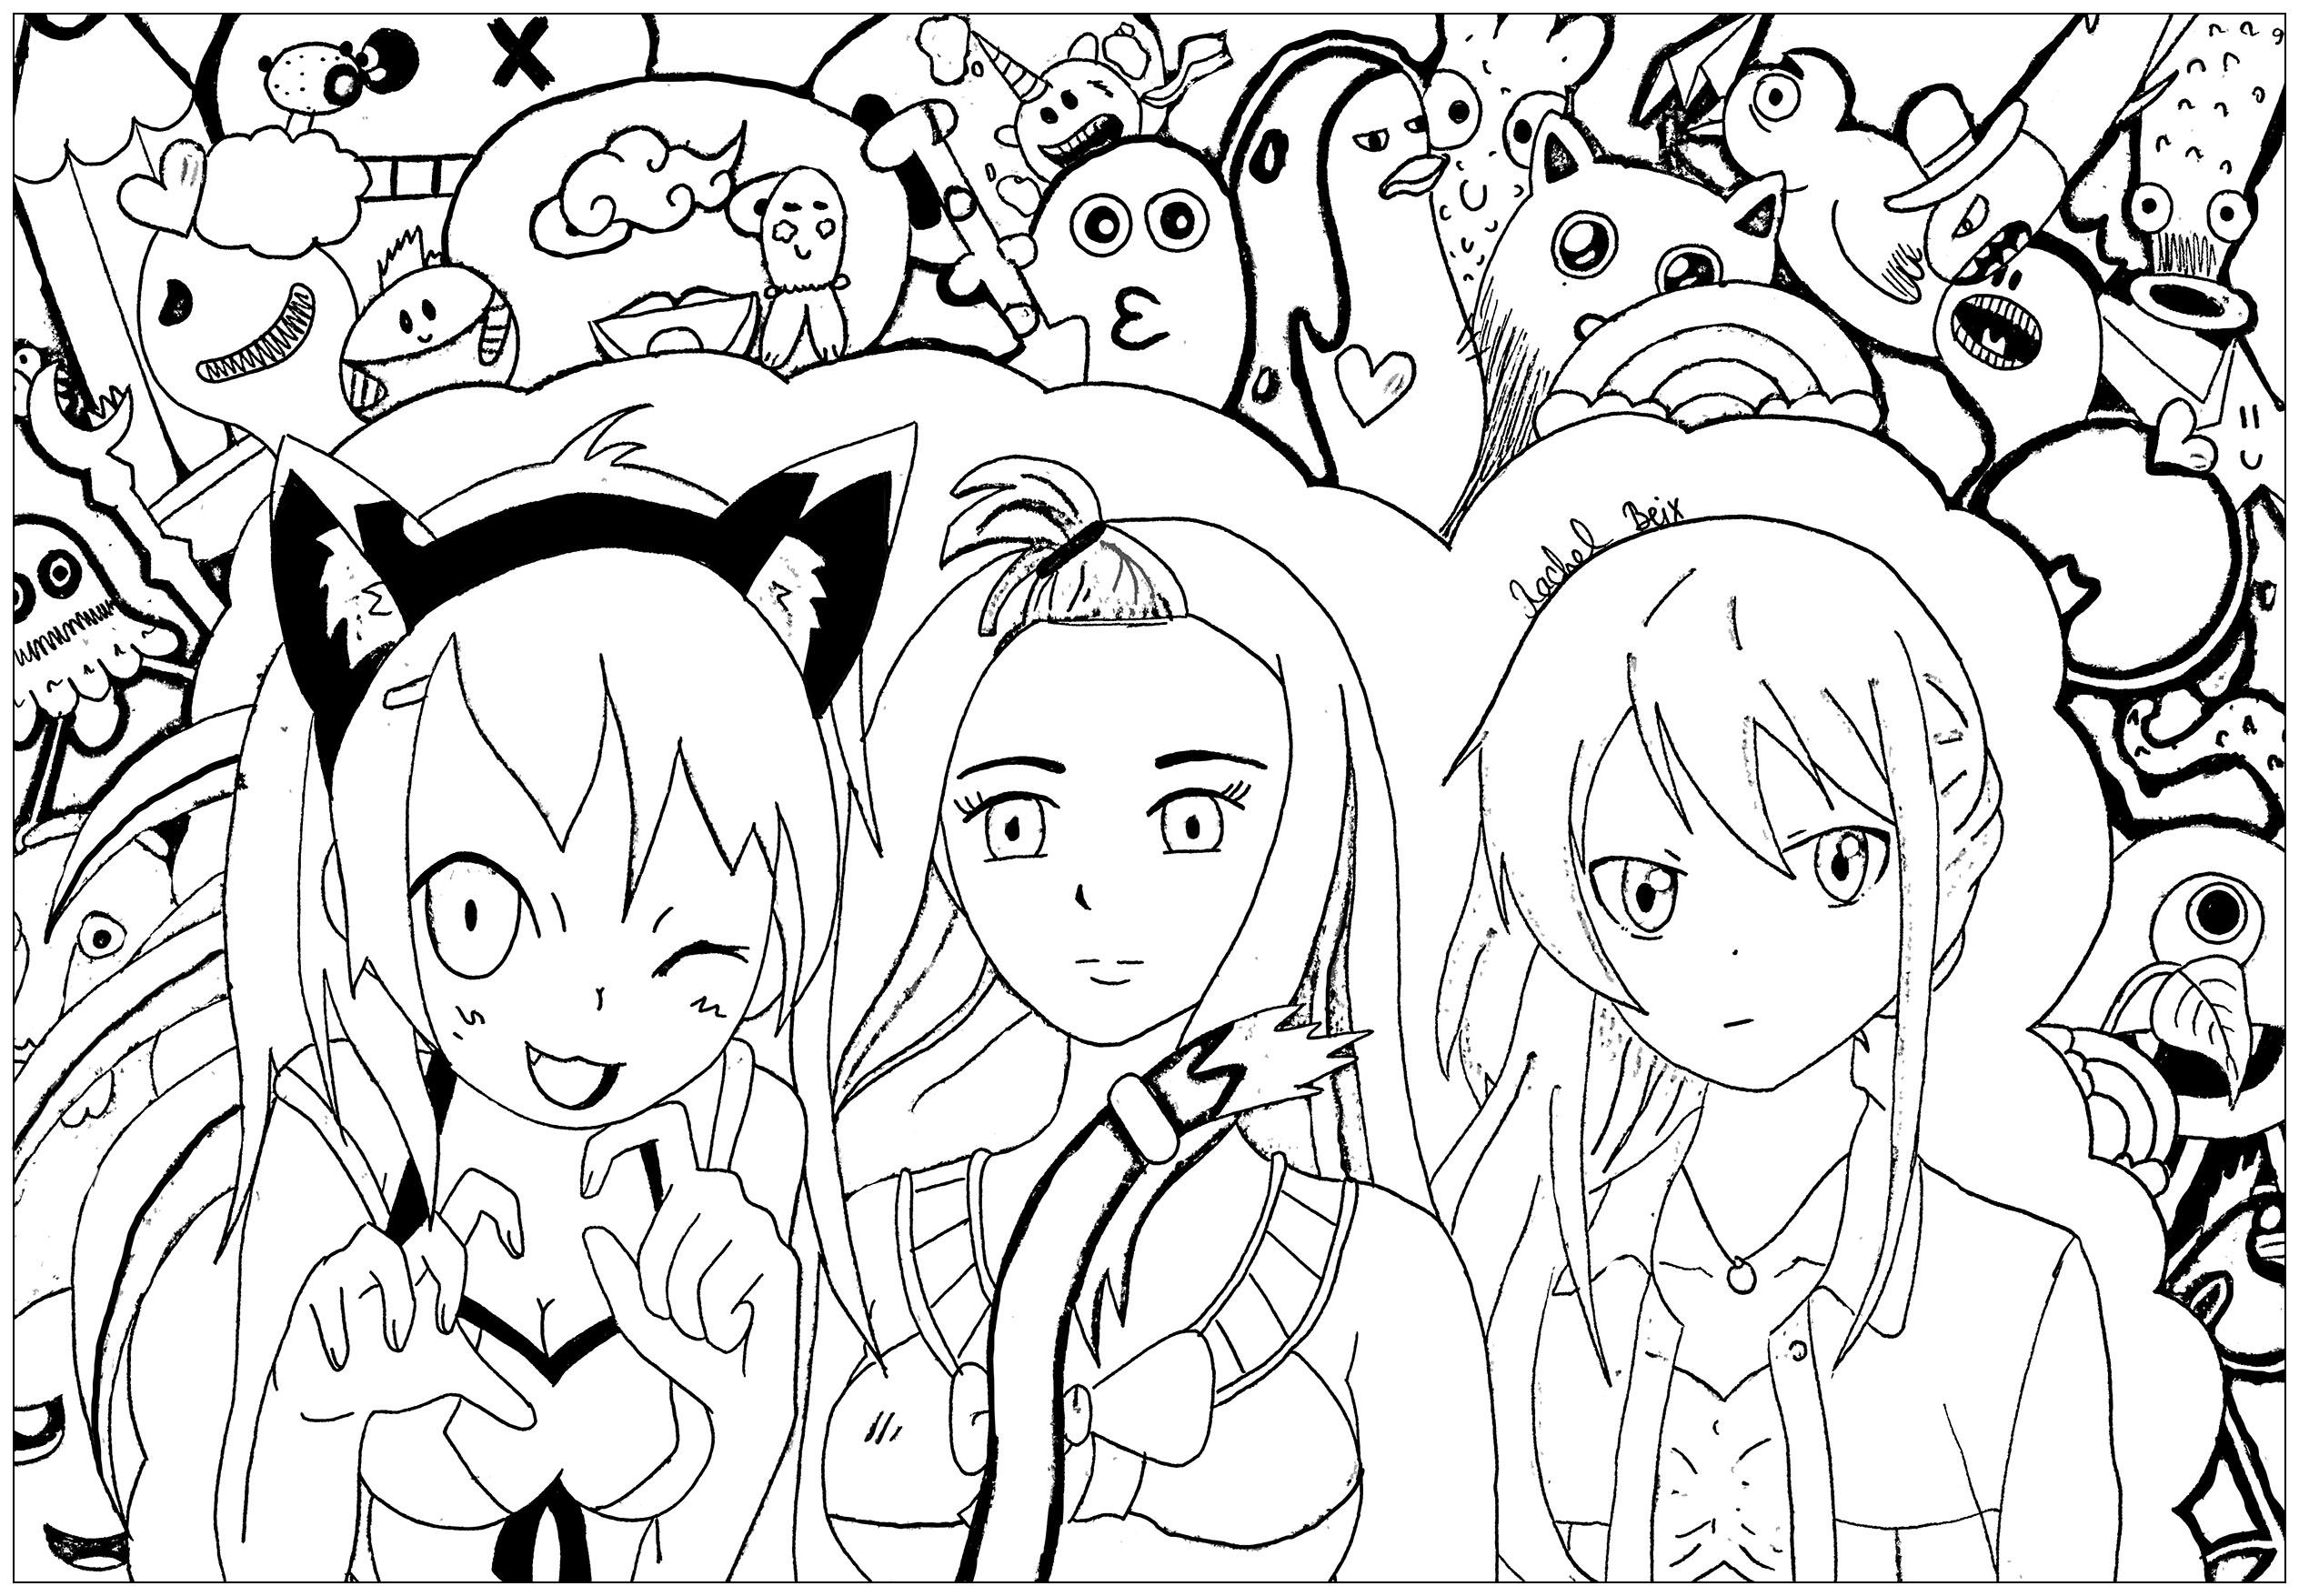 Mangas 4700 - Mangas - Malbuch Fur Erwachsene concernant Coloriage Manga Kawaii